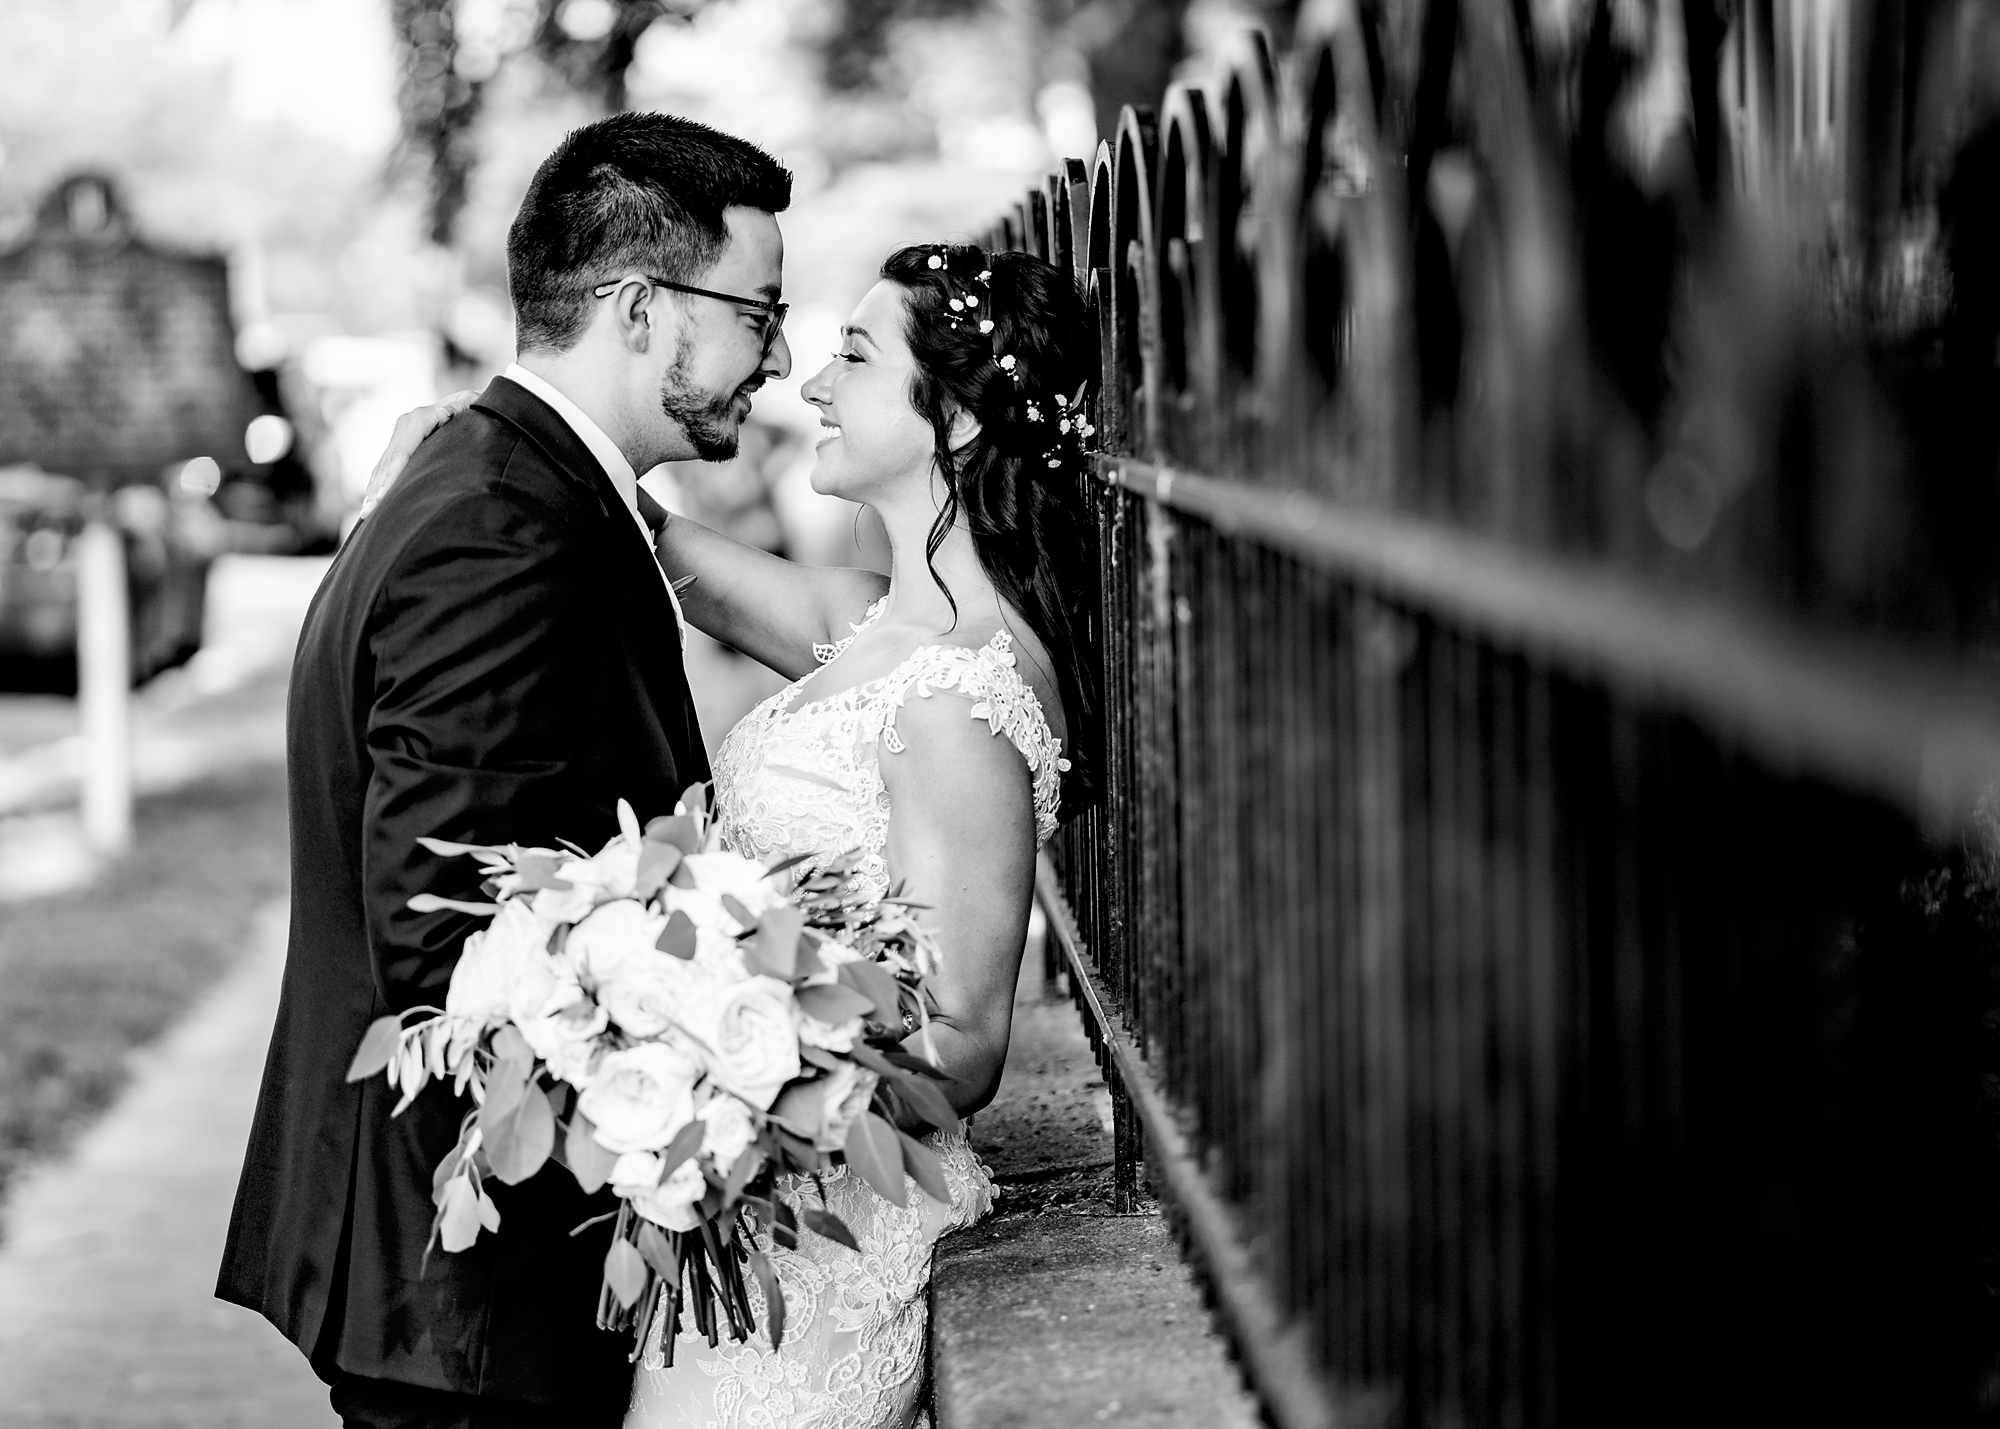 Embassy-Suites-Rivercenter-Wedding-Photography-13.jpg